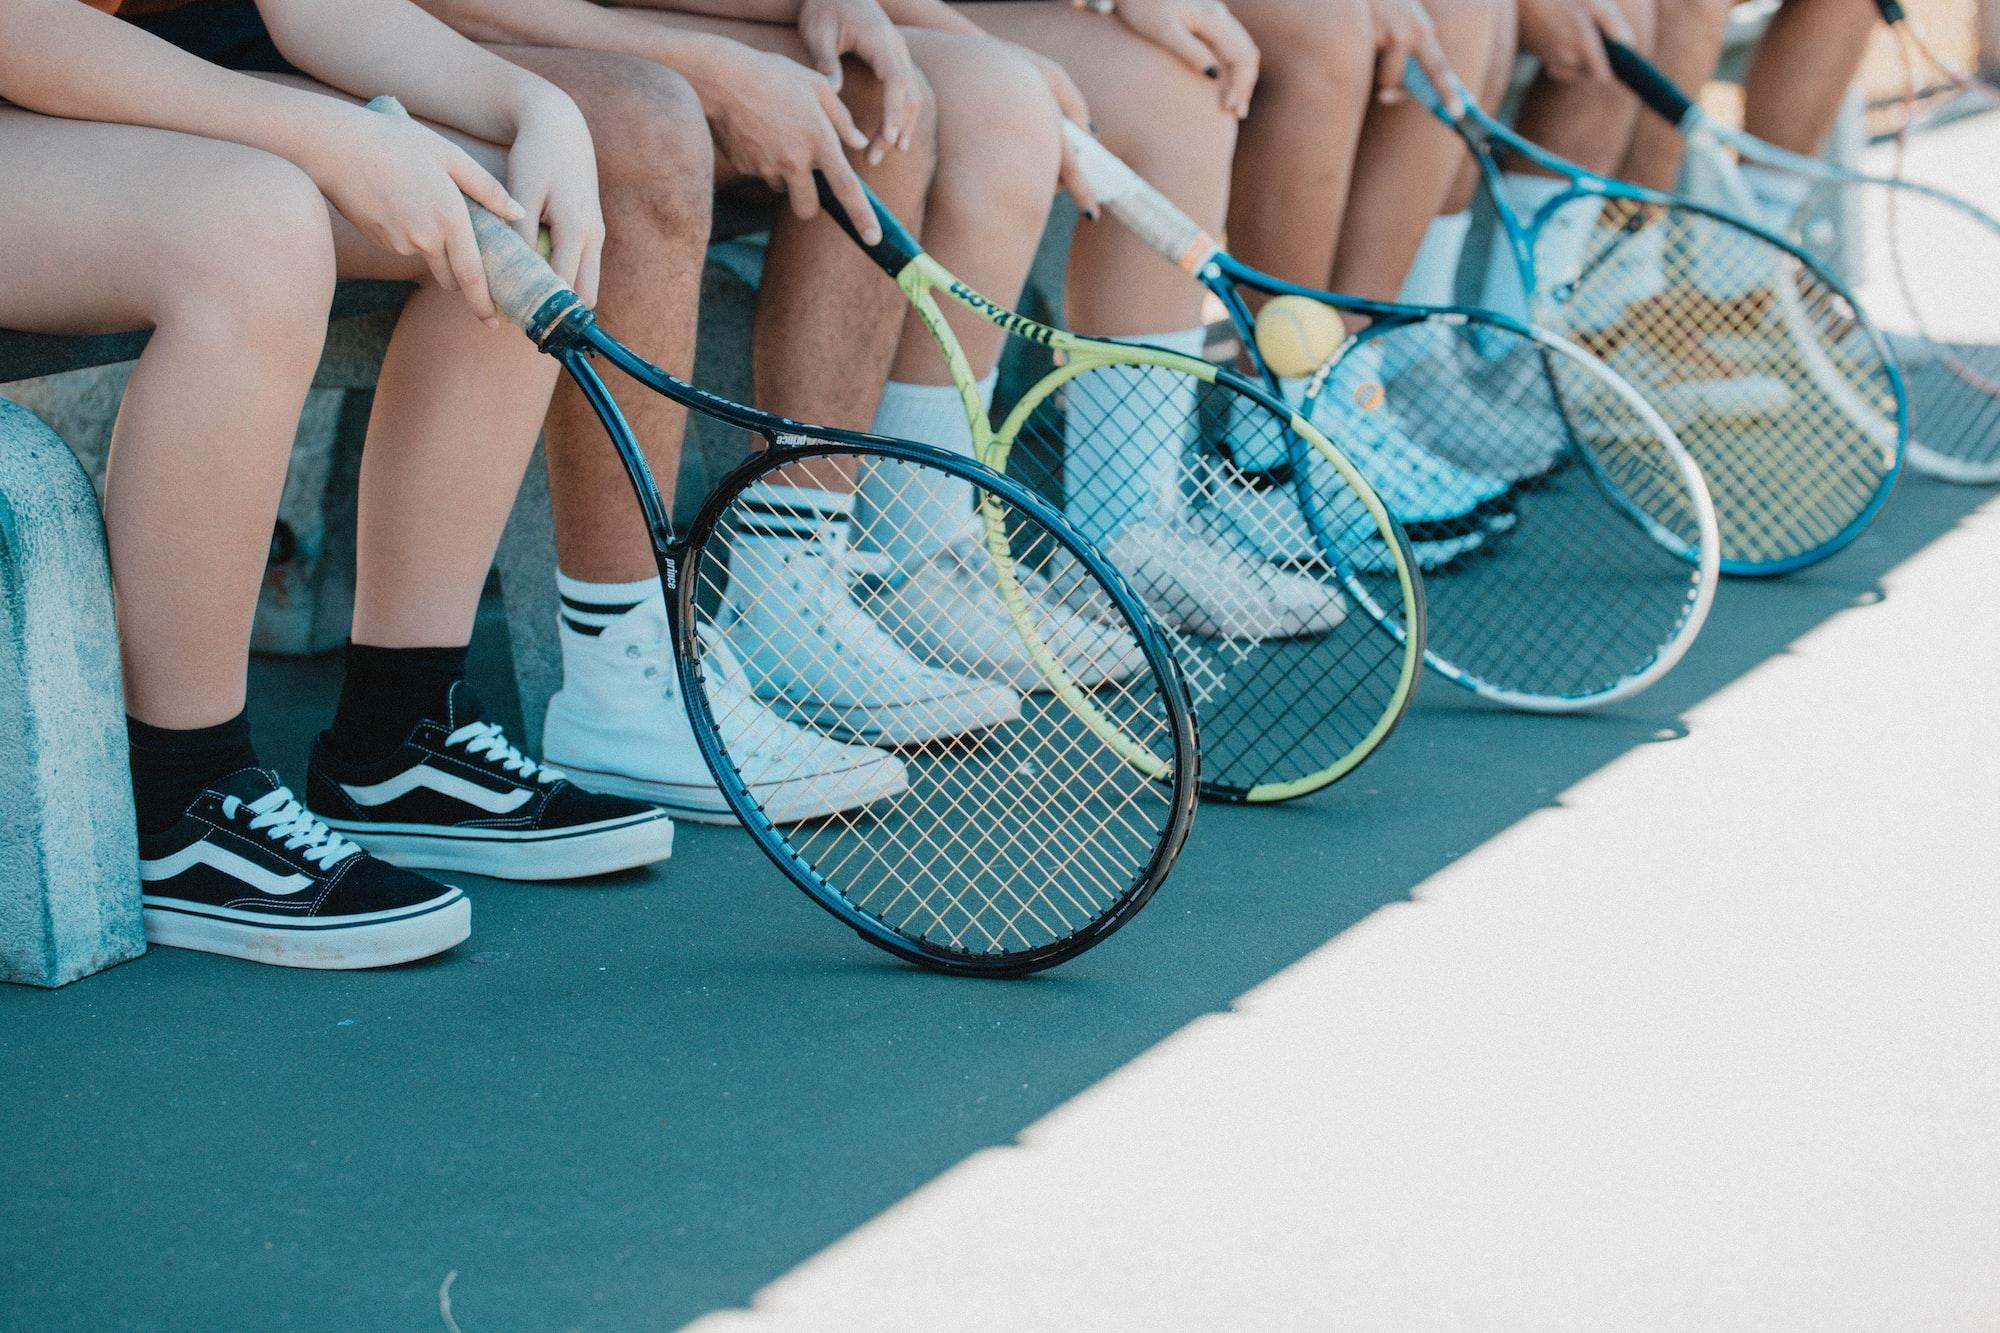 Pronostici quarti di finale tennis Olimpiadi 2020 29/07/2021